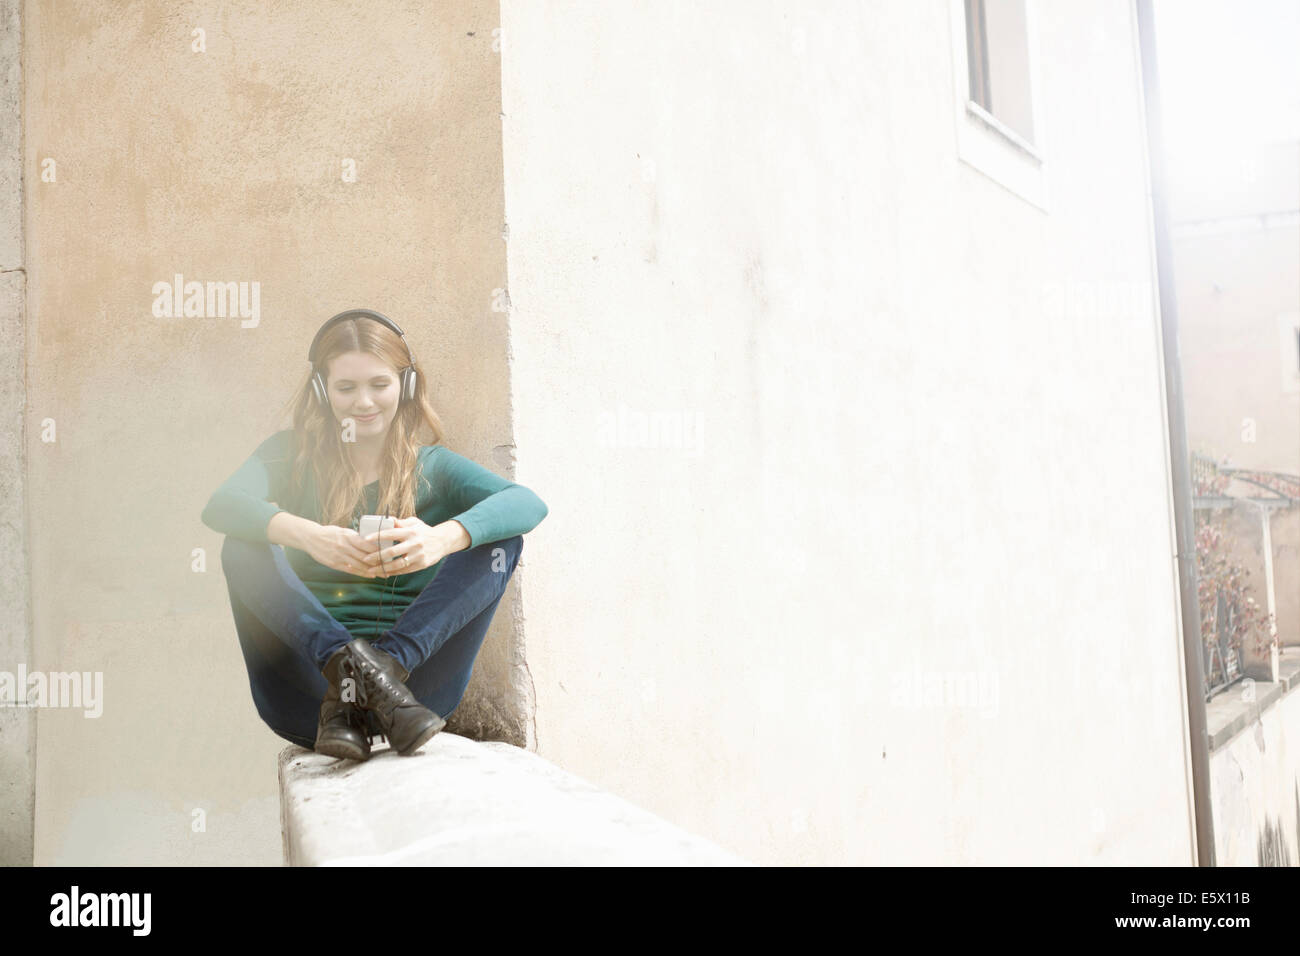 Mujer joven sentada piernas cruzadas escuchando música a través de auriculares Imagen De Stock